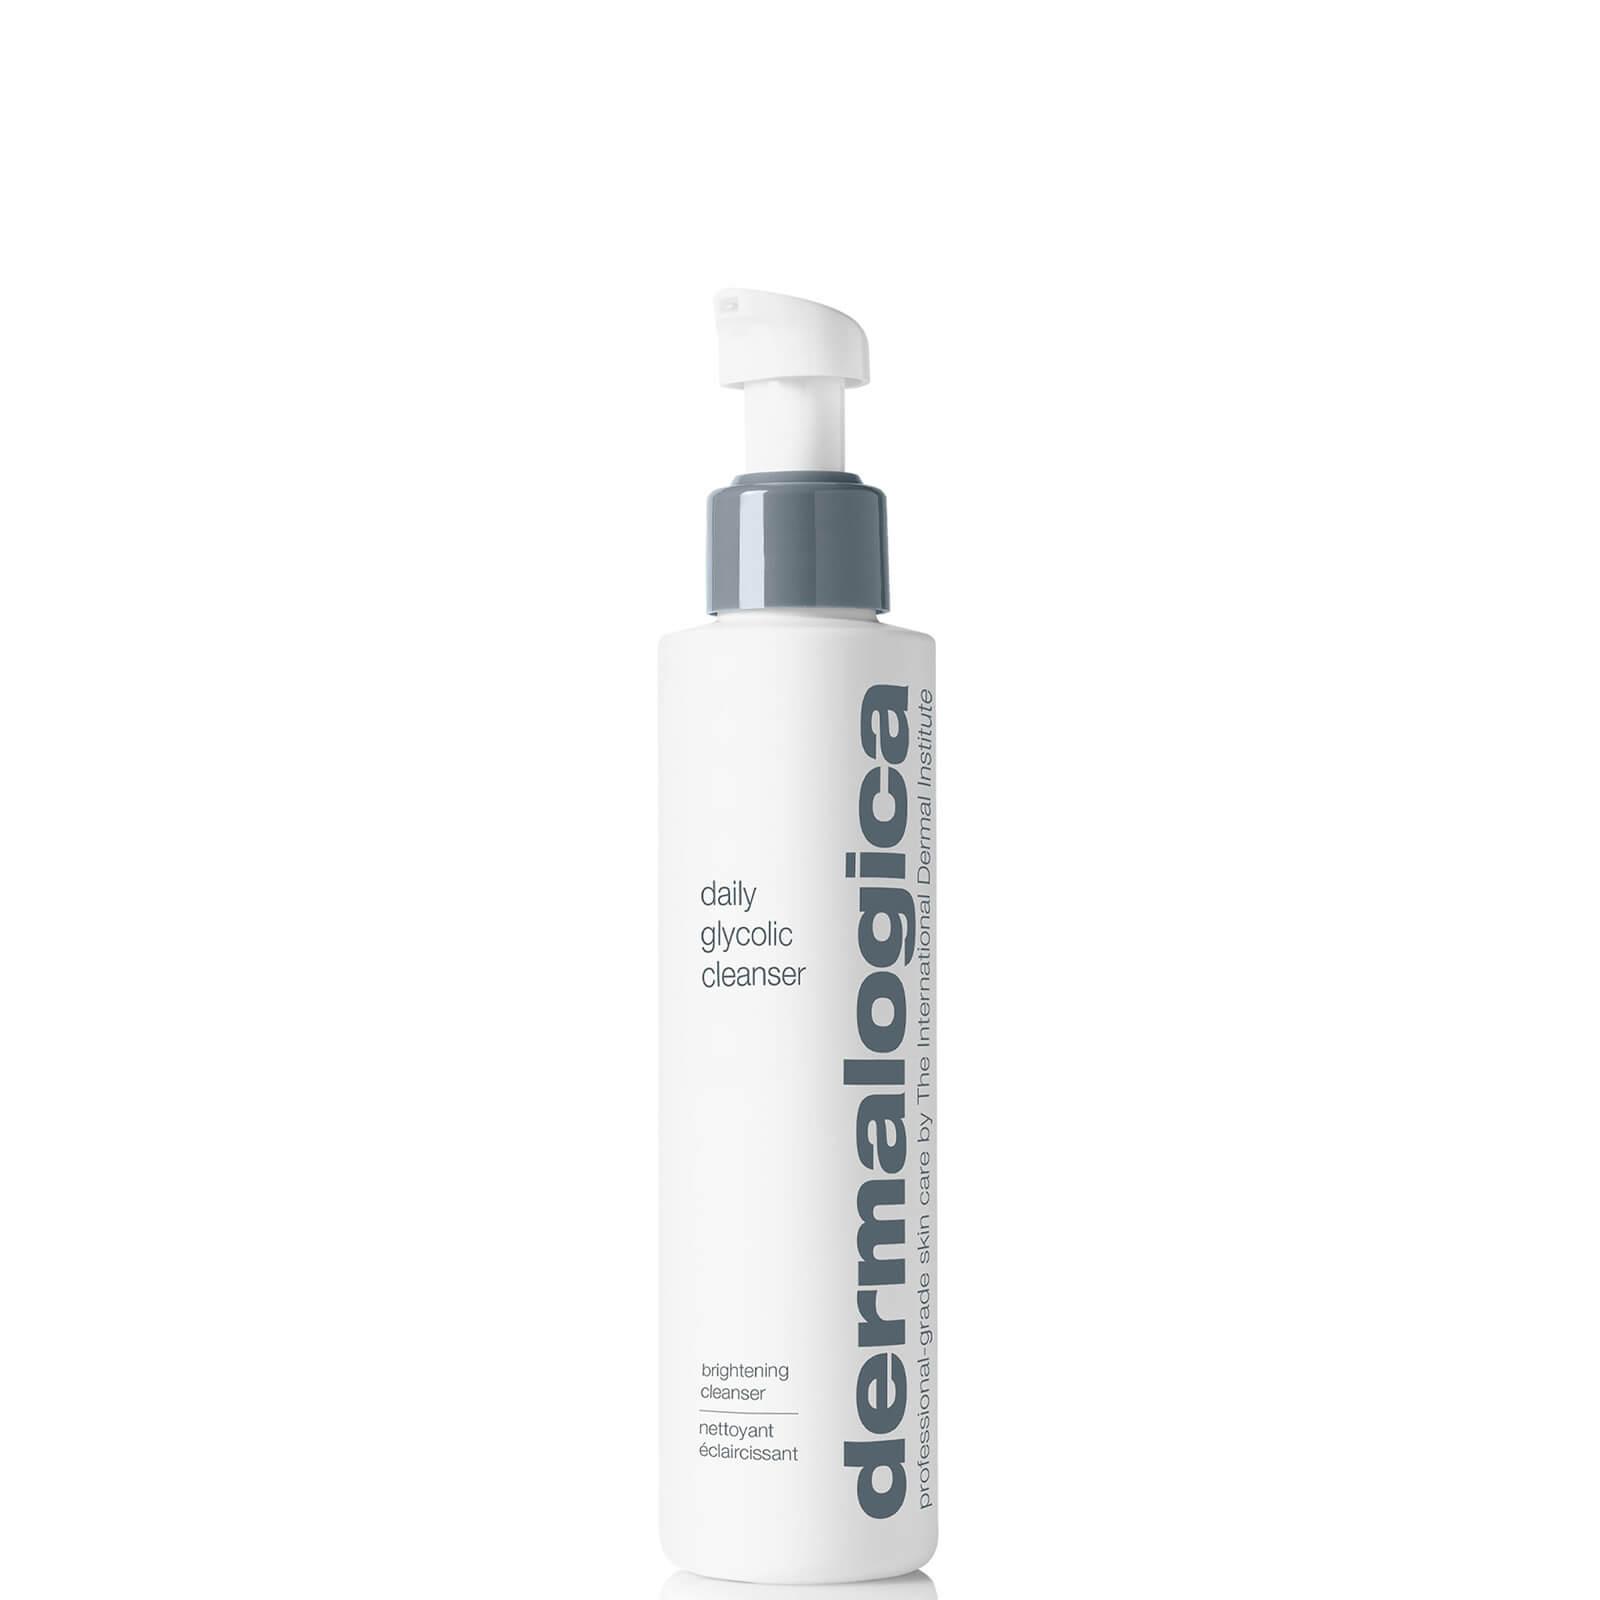 Купить Dermalogica Daily Glycolic Cleanser 150ml